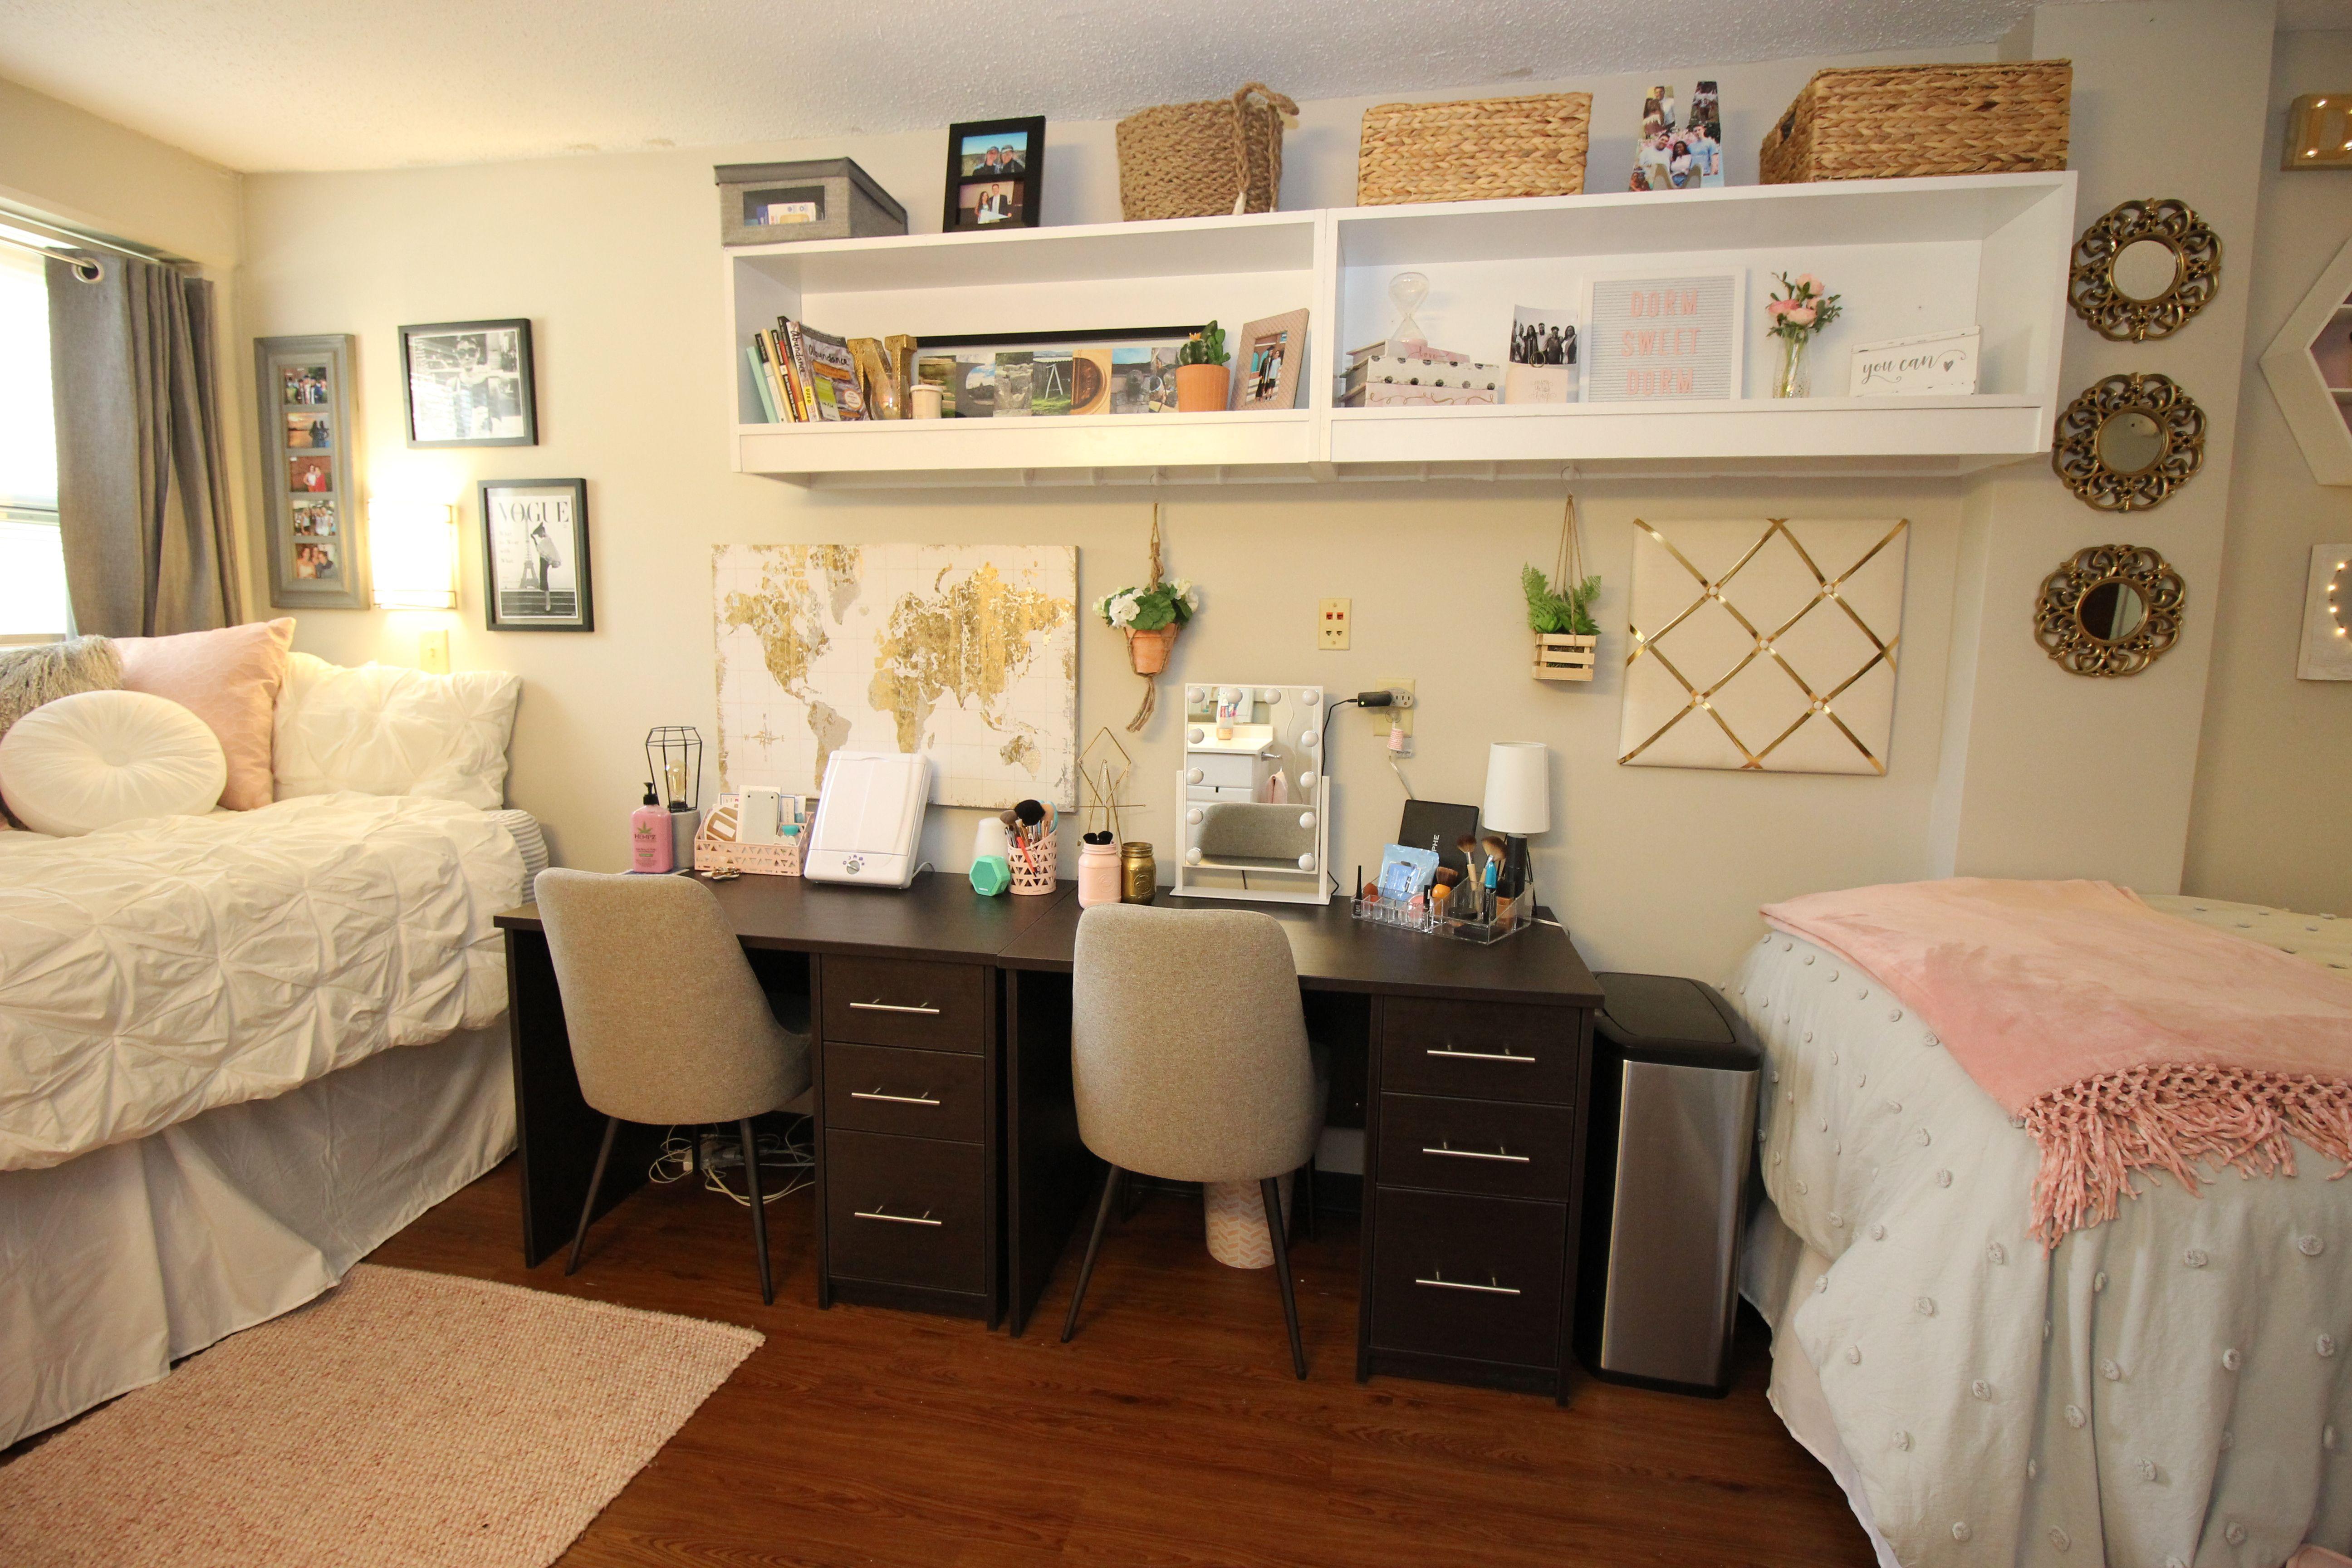 Traditional Double Room Dorm Room Decor Dorm Room Inspiration